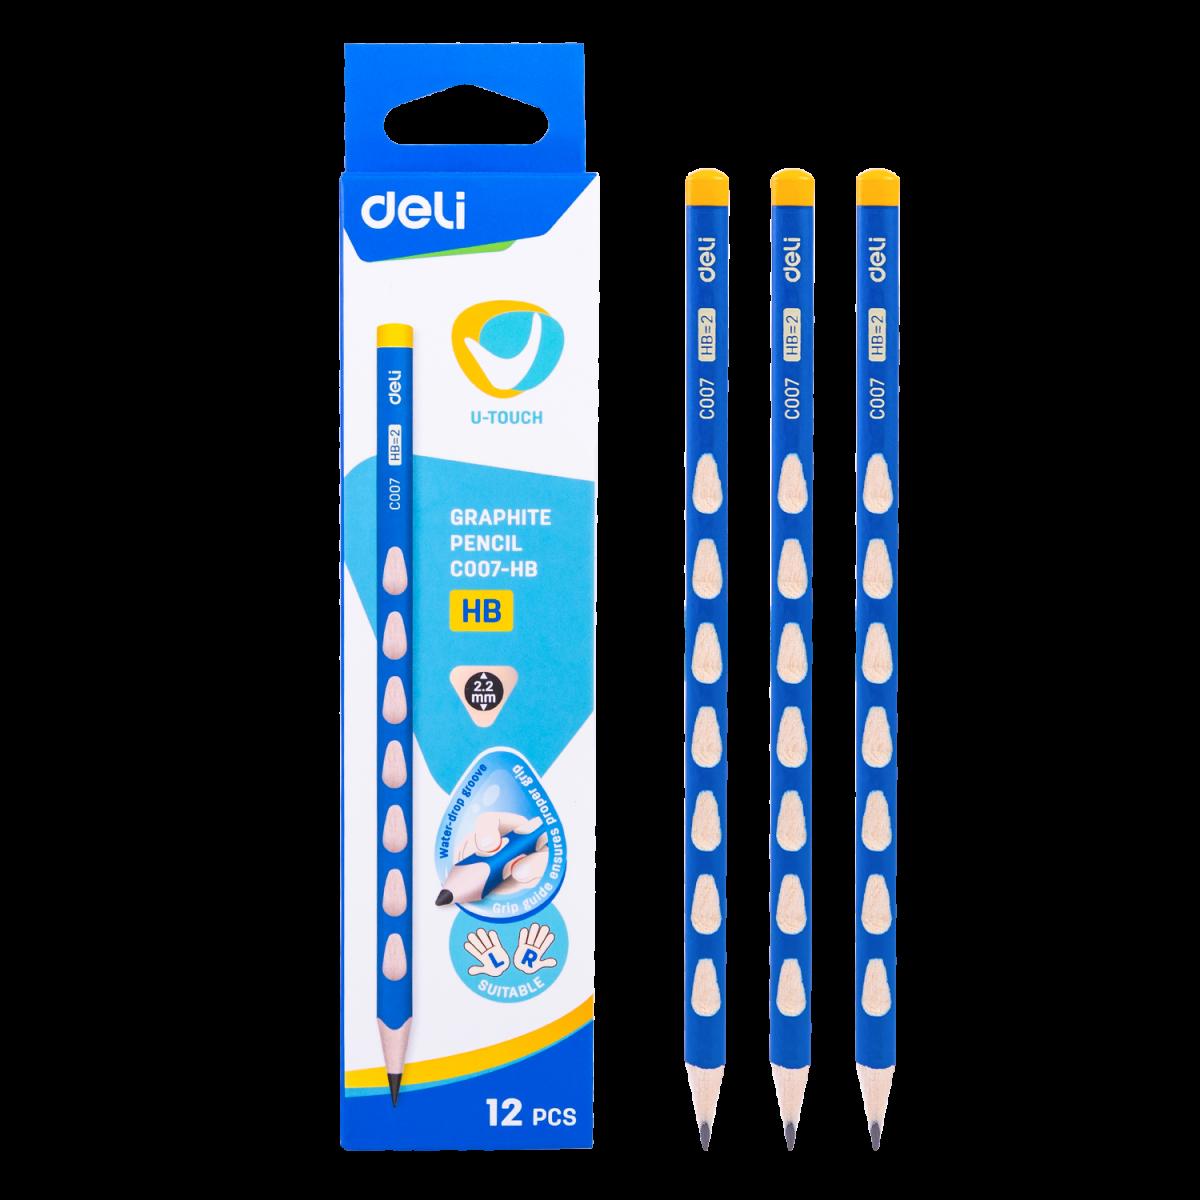 DELI ดินสอไม้ (12แท่ง)